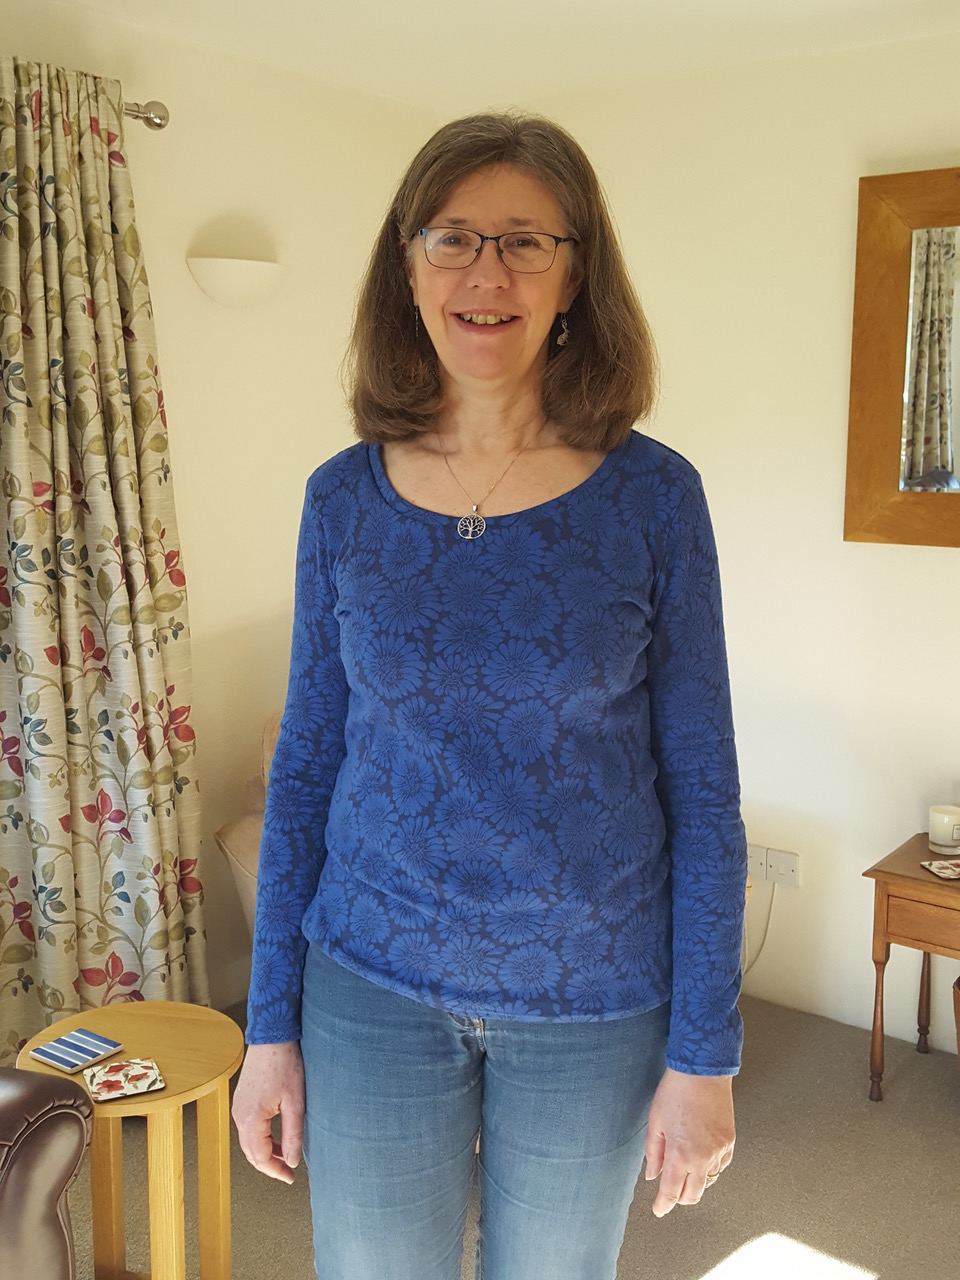 cobalt jacquard knit jersey agnes t-shirt